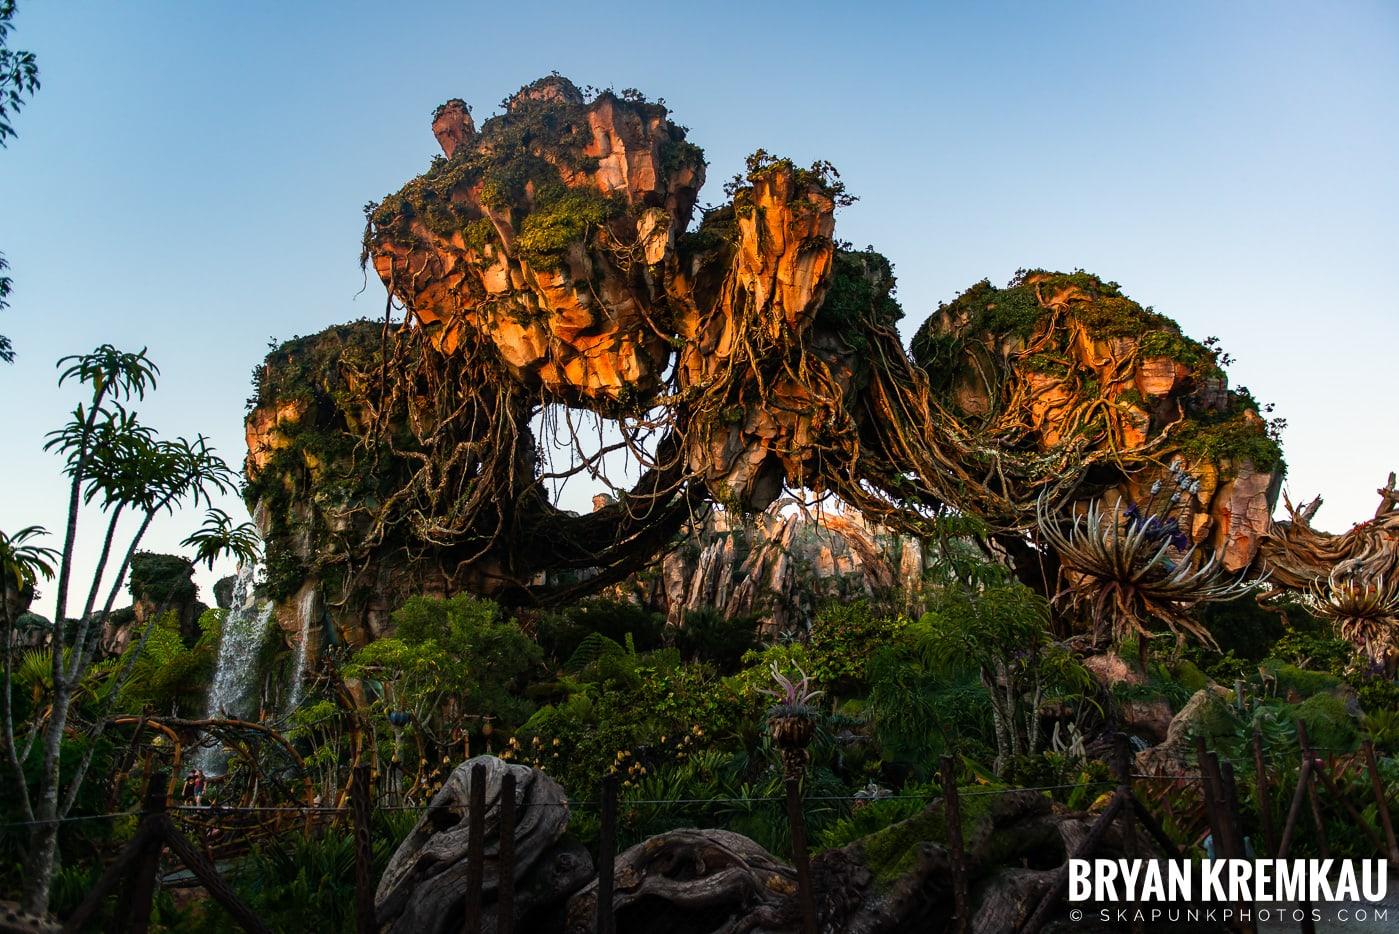 Walt Disney World Vacation: Day 5 (Animal Kingdom / Disney's Hollywood Studios) - 10.3.19 (82)